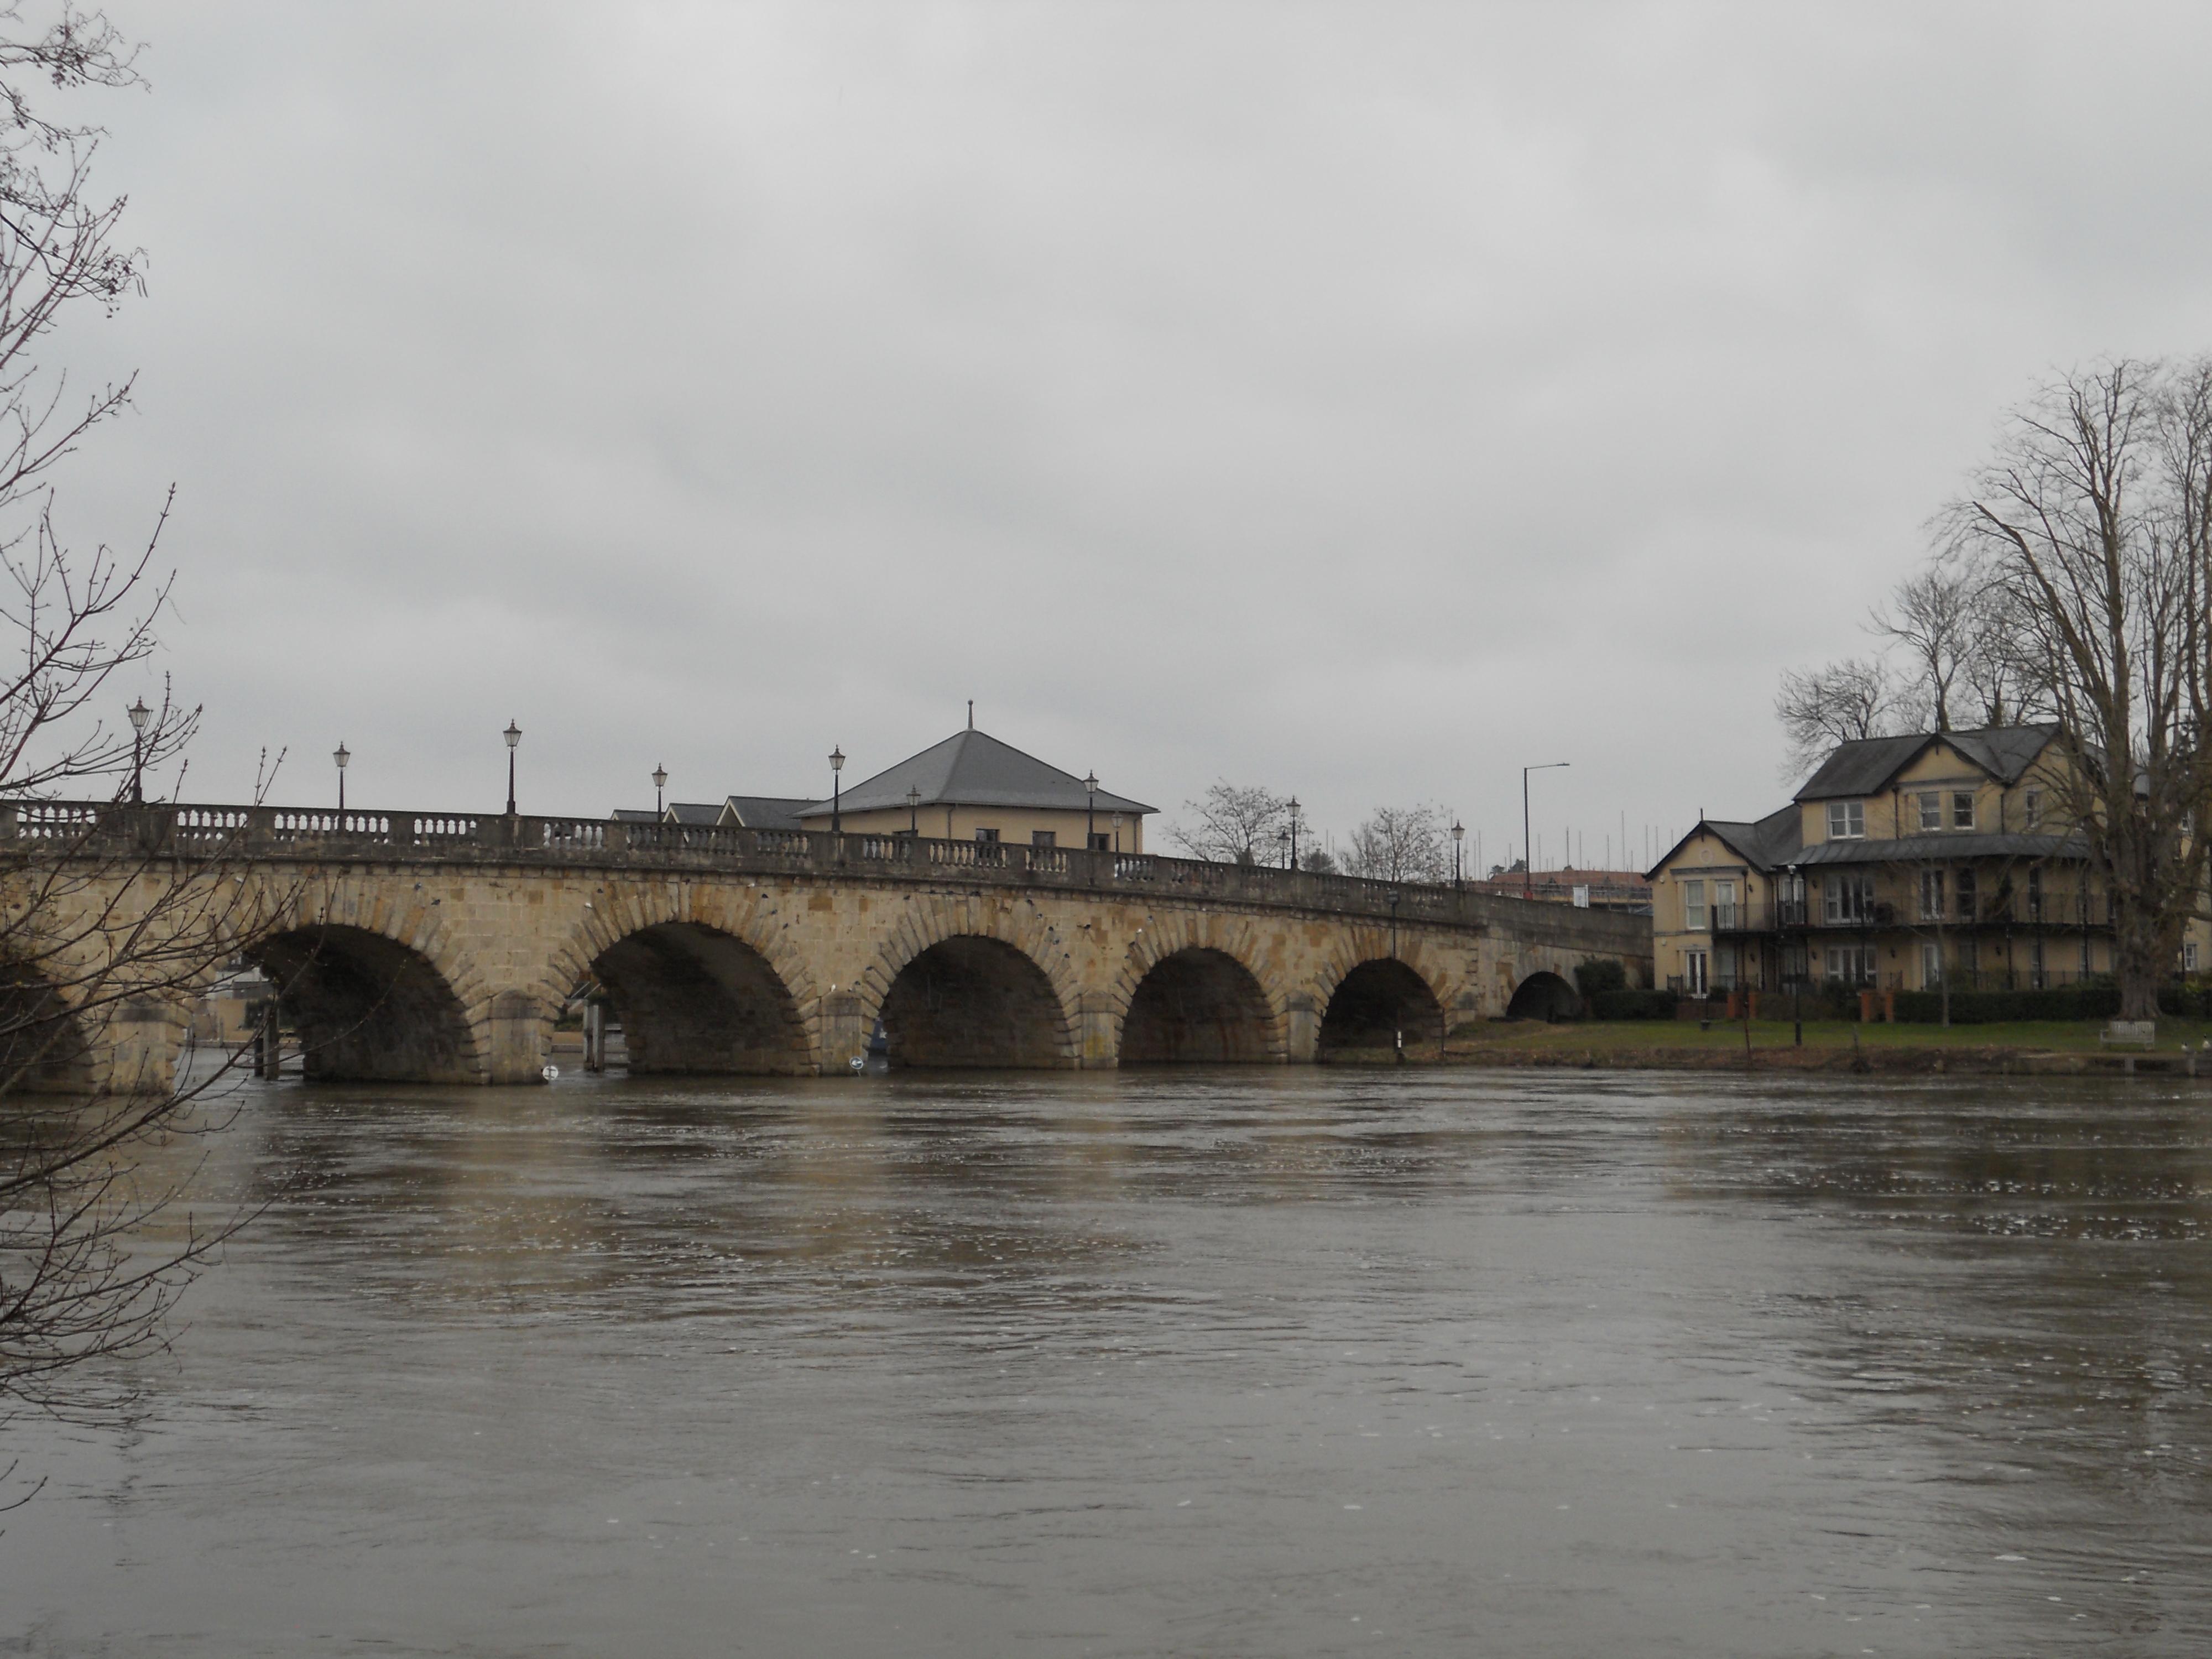 Maidenhead bridge from Reitlinger Open Space